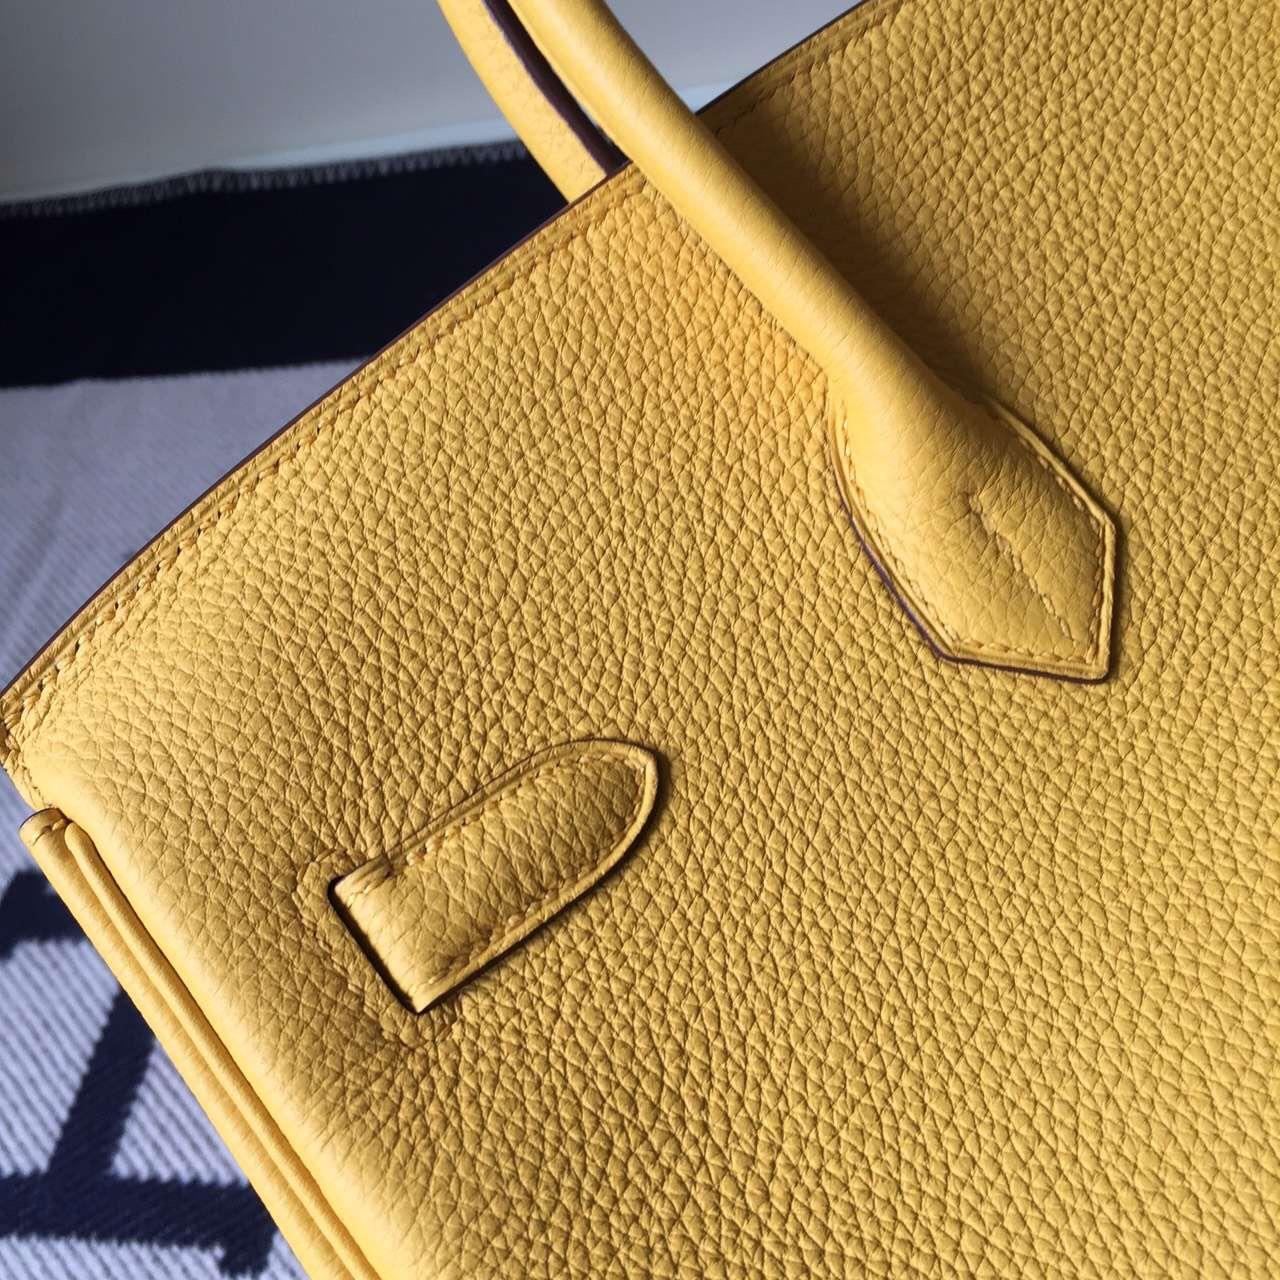 Discount Hermes Togo Calfskin Birkin35cm Bag in Fennel Yellow